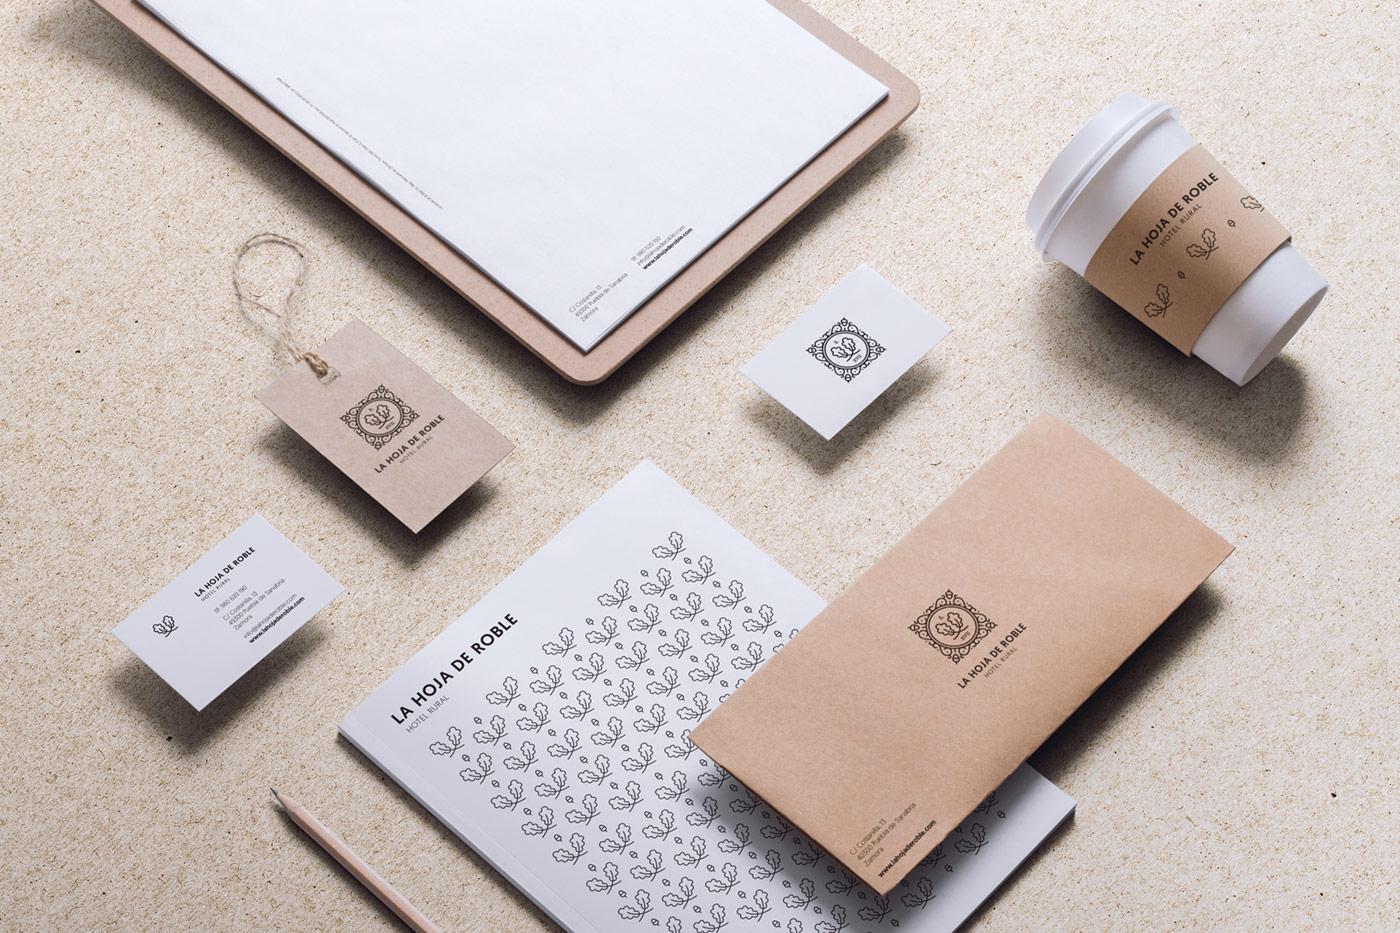 pixelarte-estudio-diseno-grafico-especializado-hoteles-Diseno-papeleria-corporativa